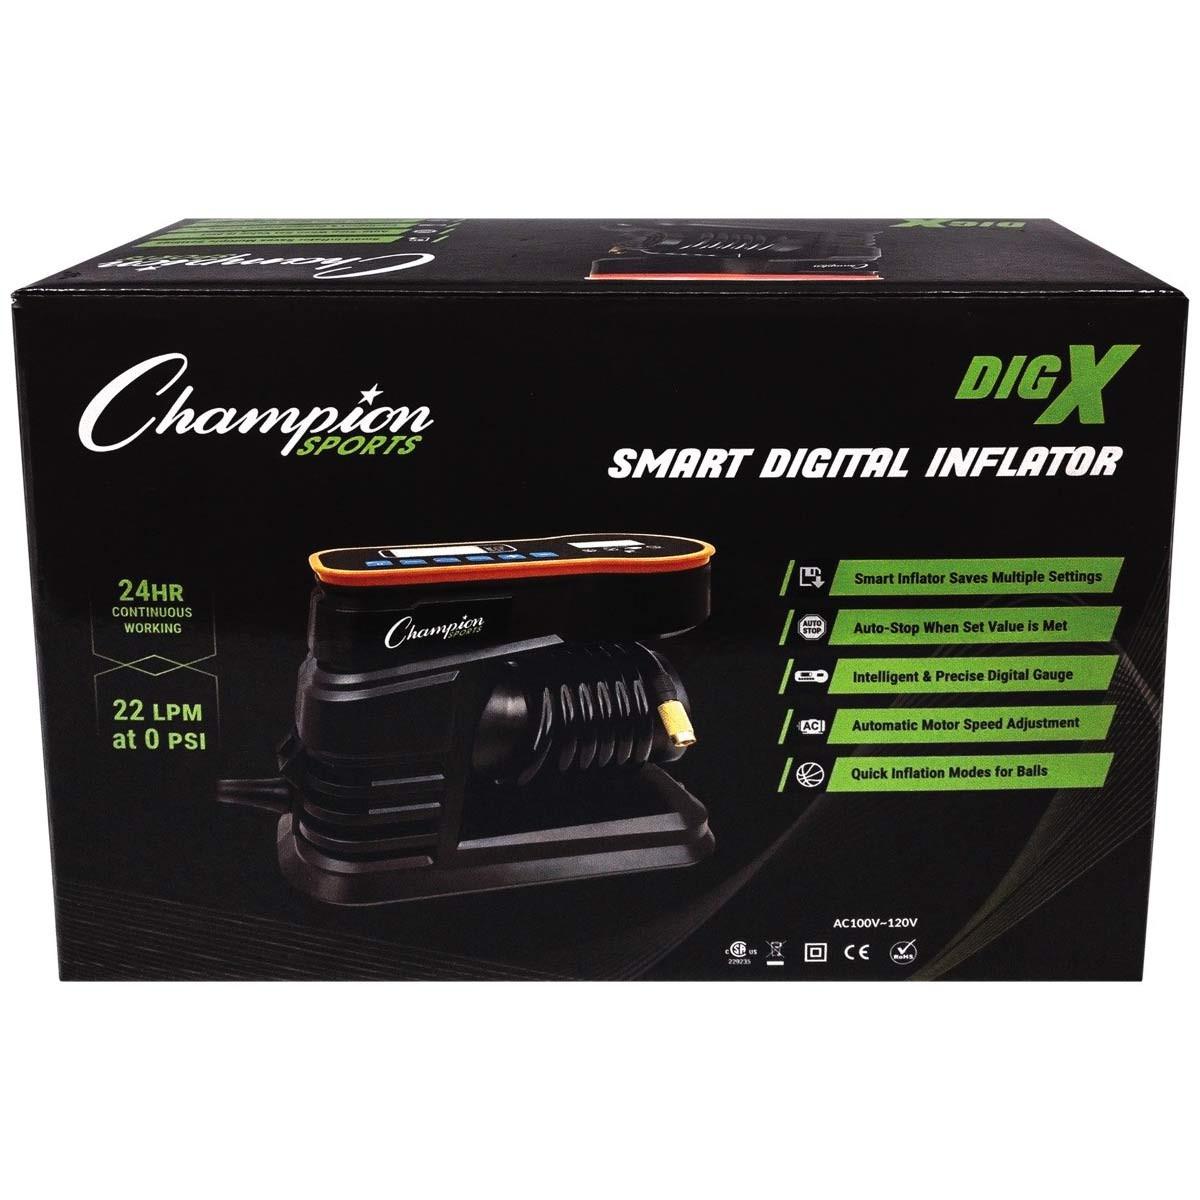 Champion Sports Smart Digital Inflator (DIGX)